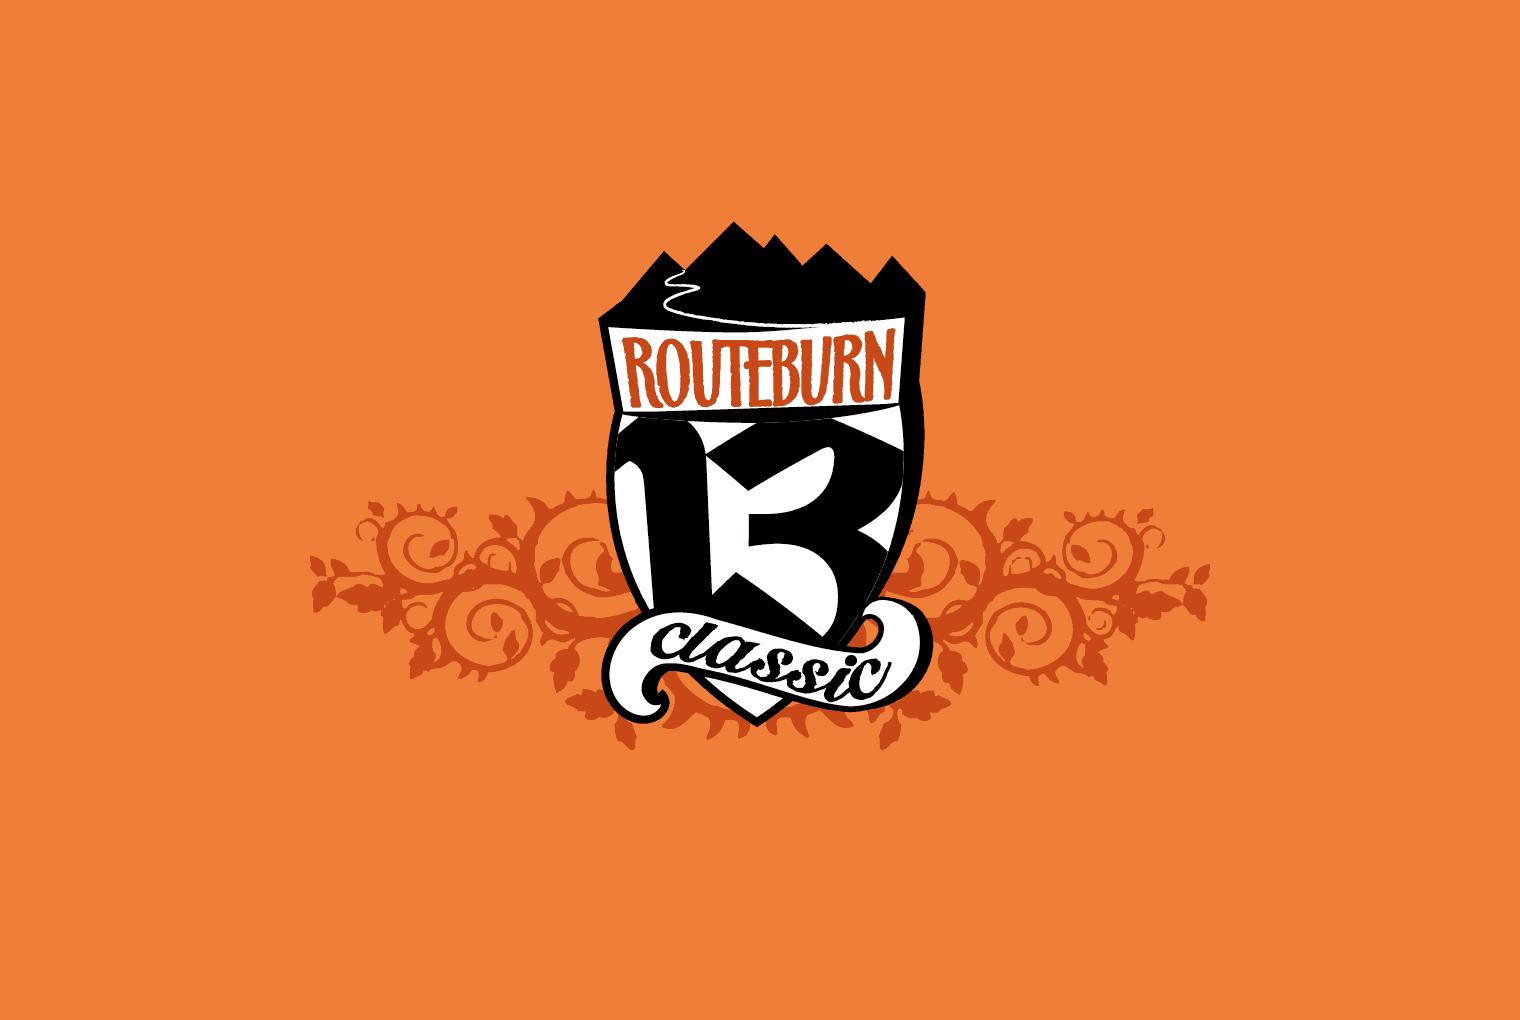 Logos_03_Routeburn